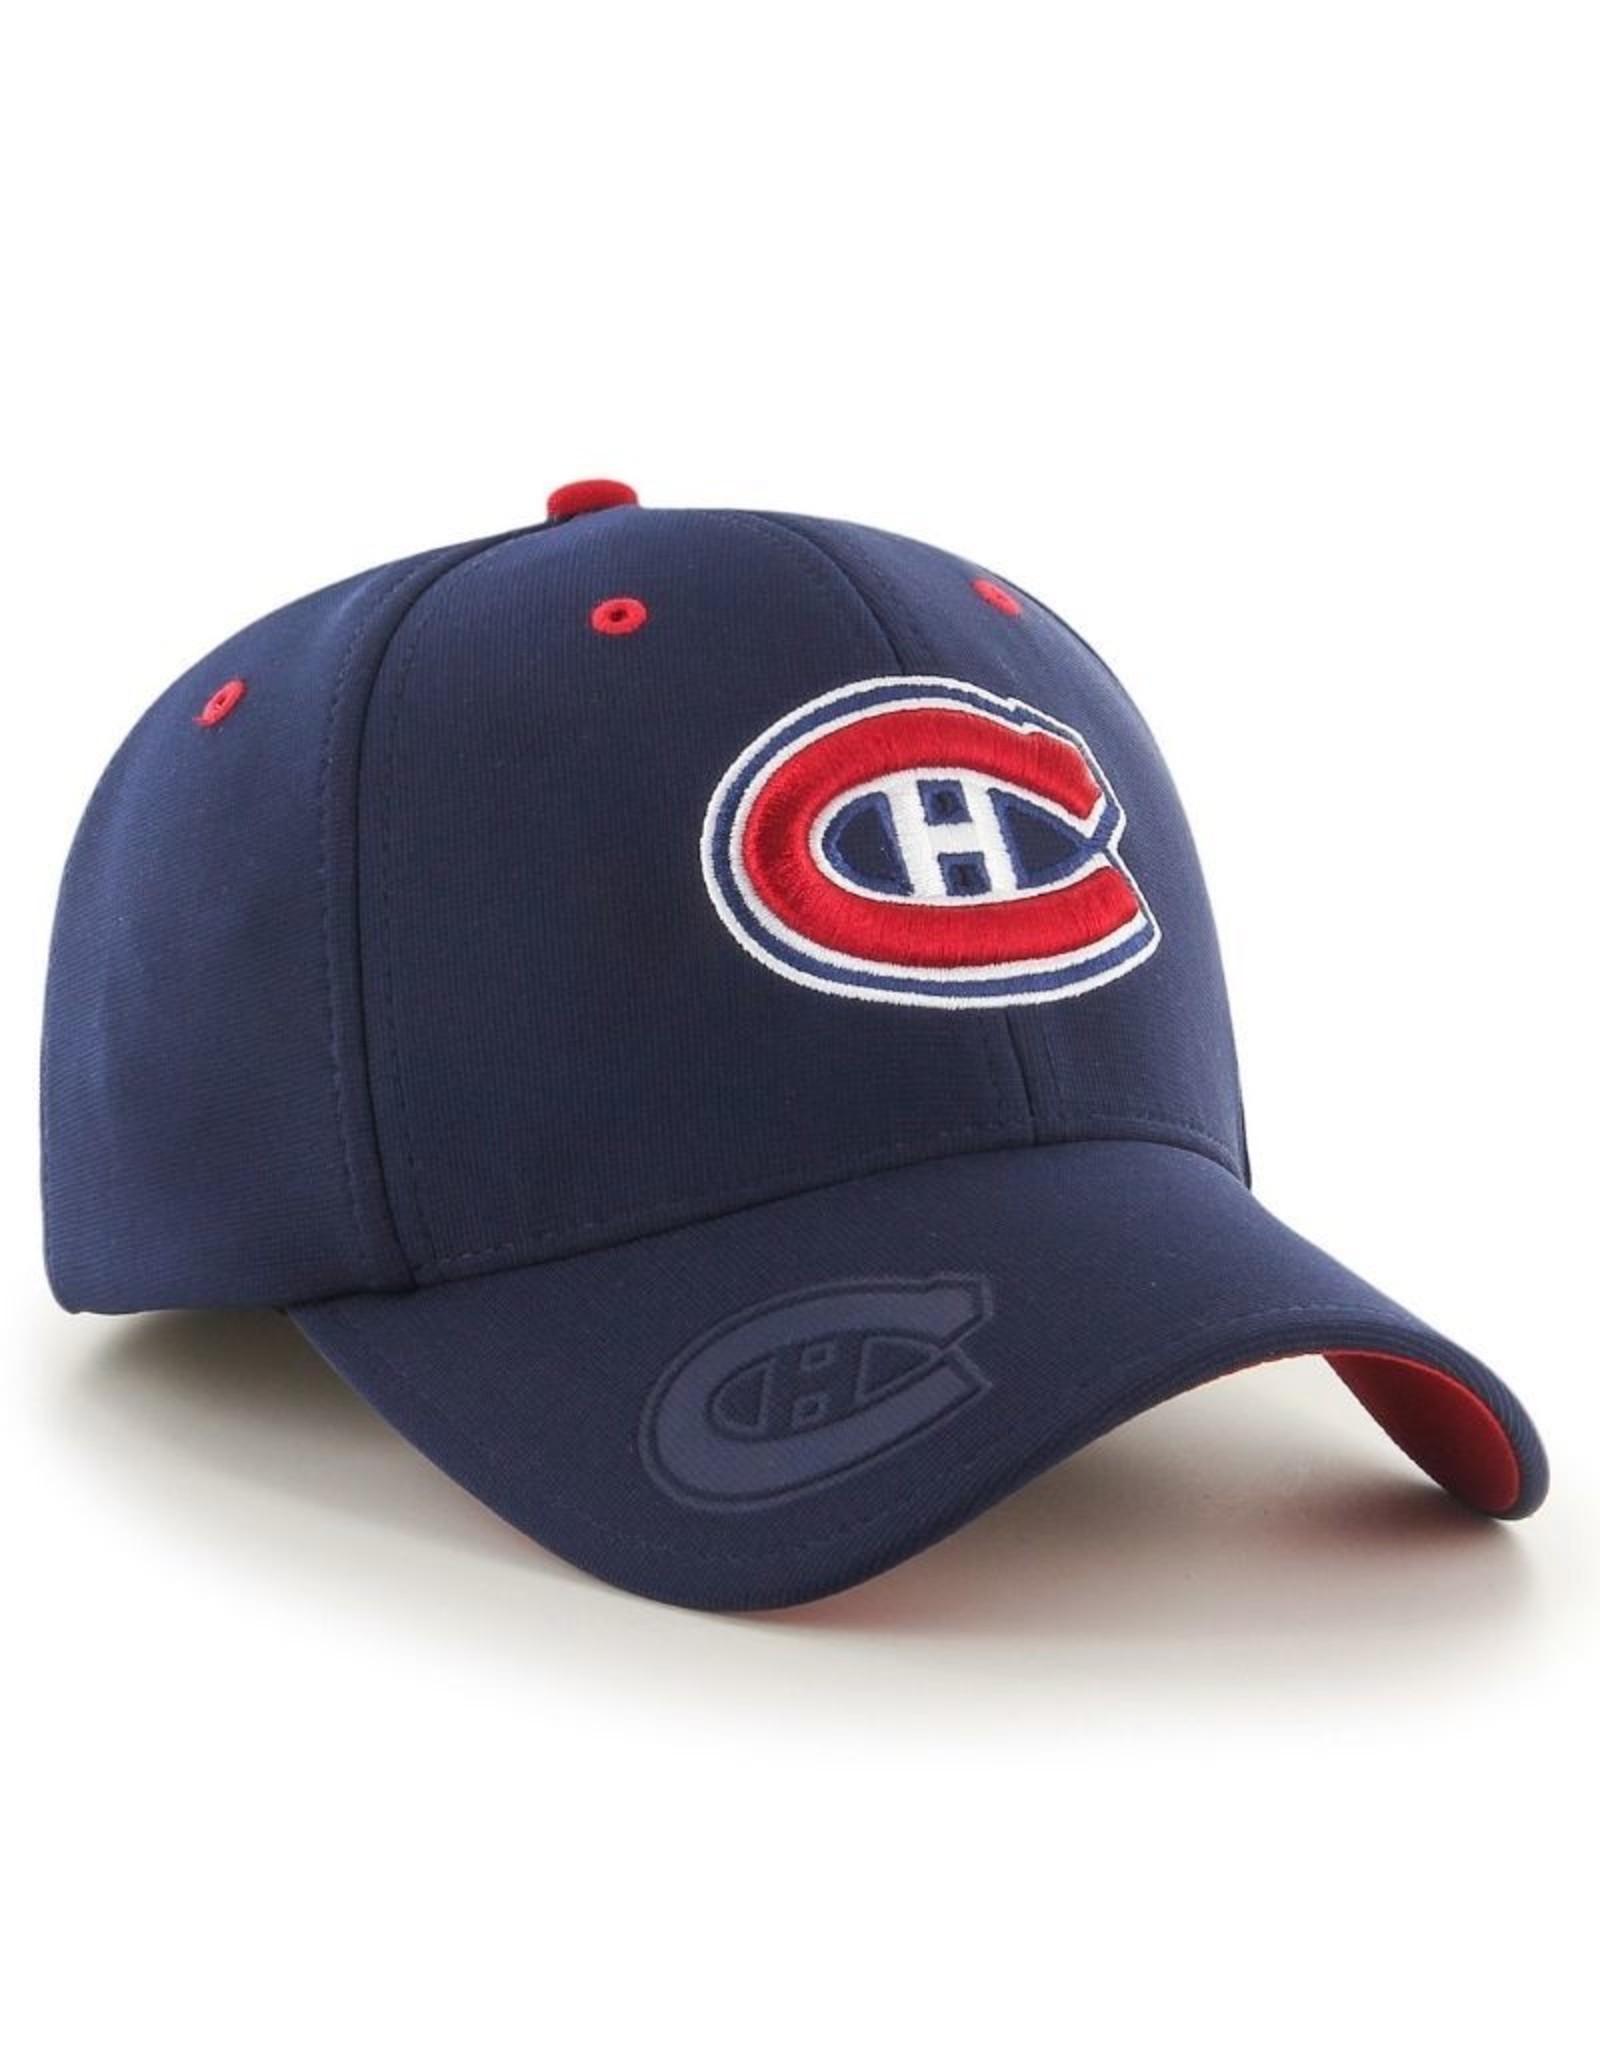 American Needle American Needle E Boss Men's Hat Montreal Canadiens Navy